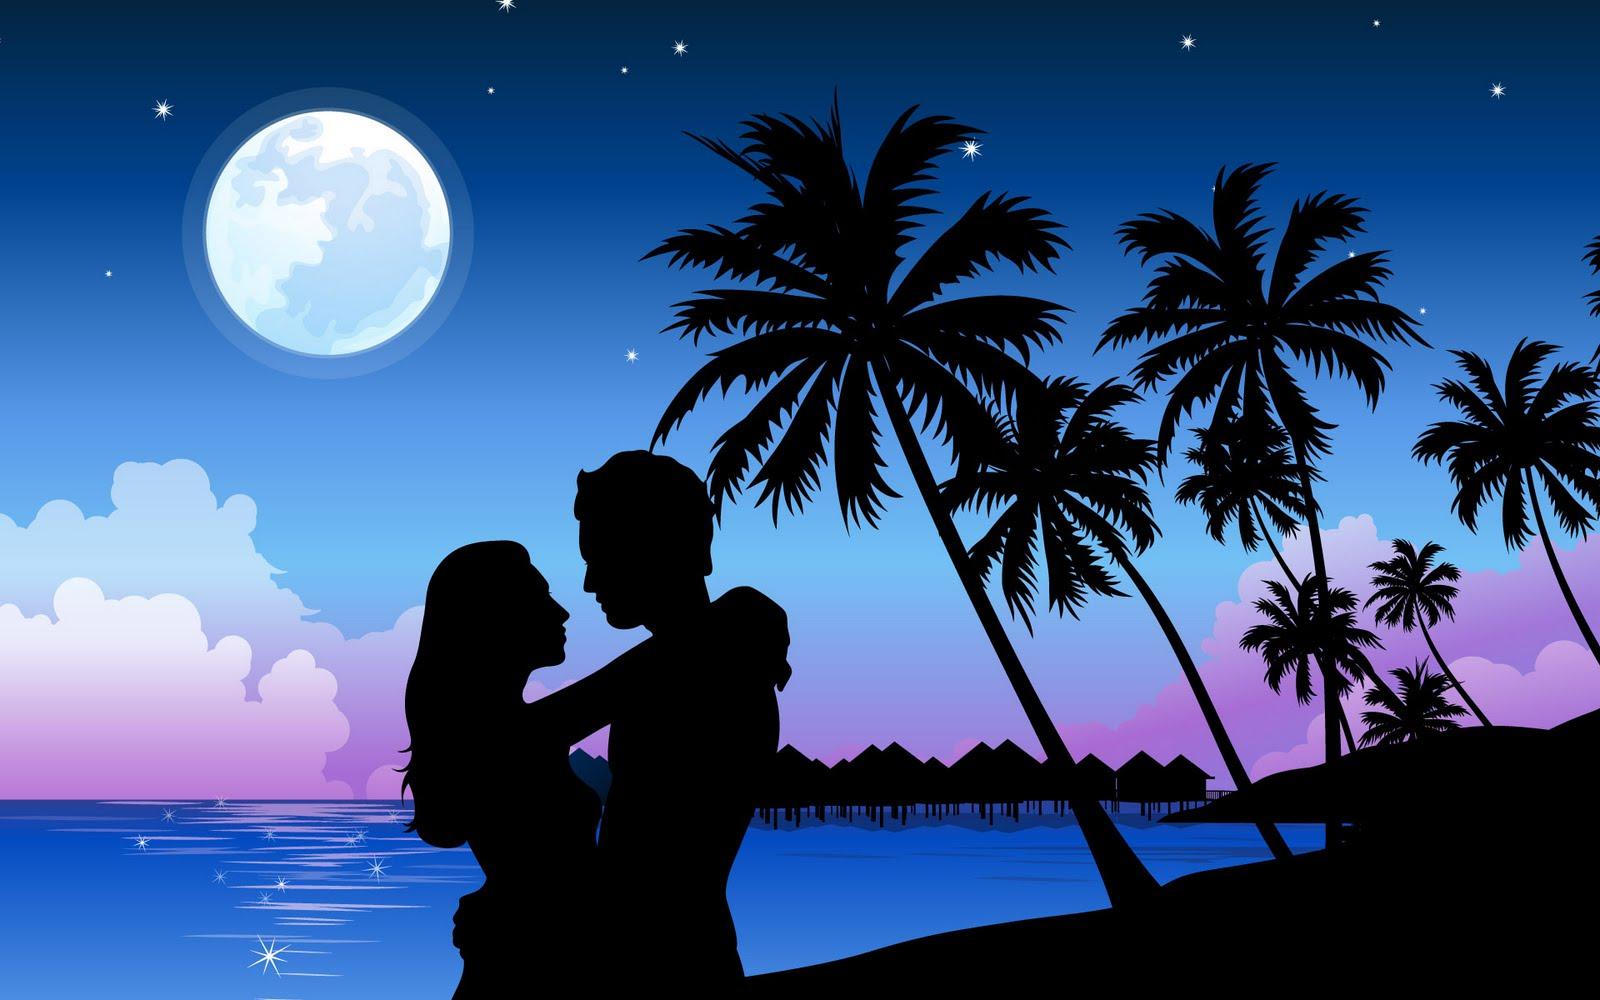 Romantic Wallpaper In The Beach